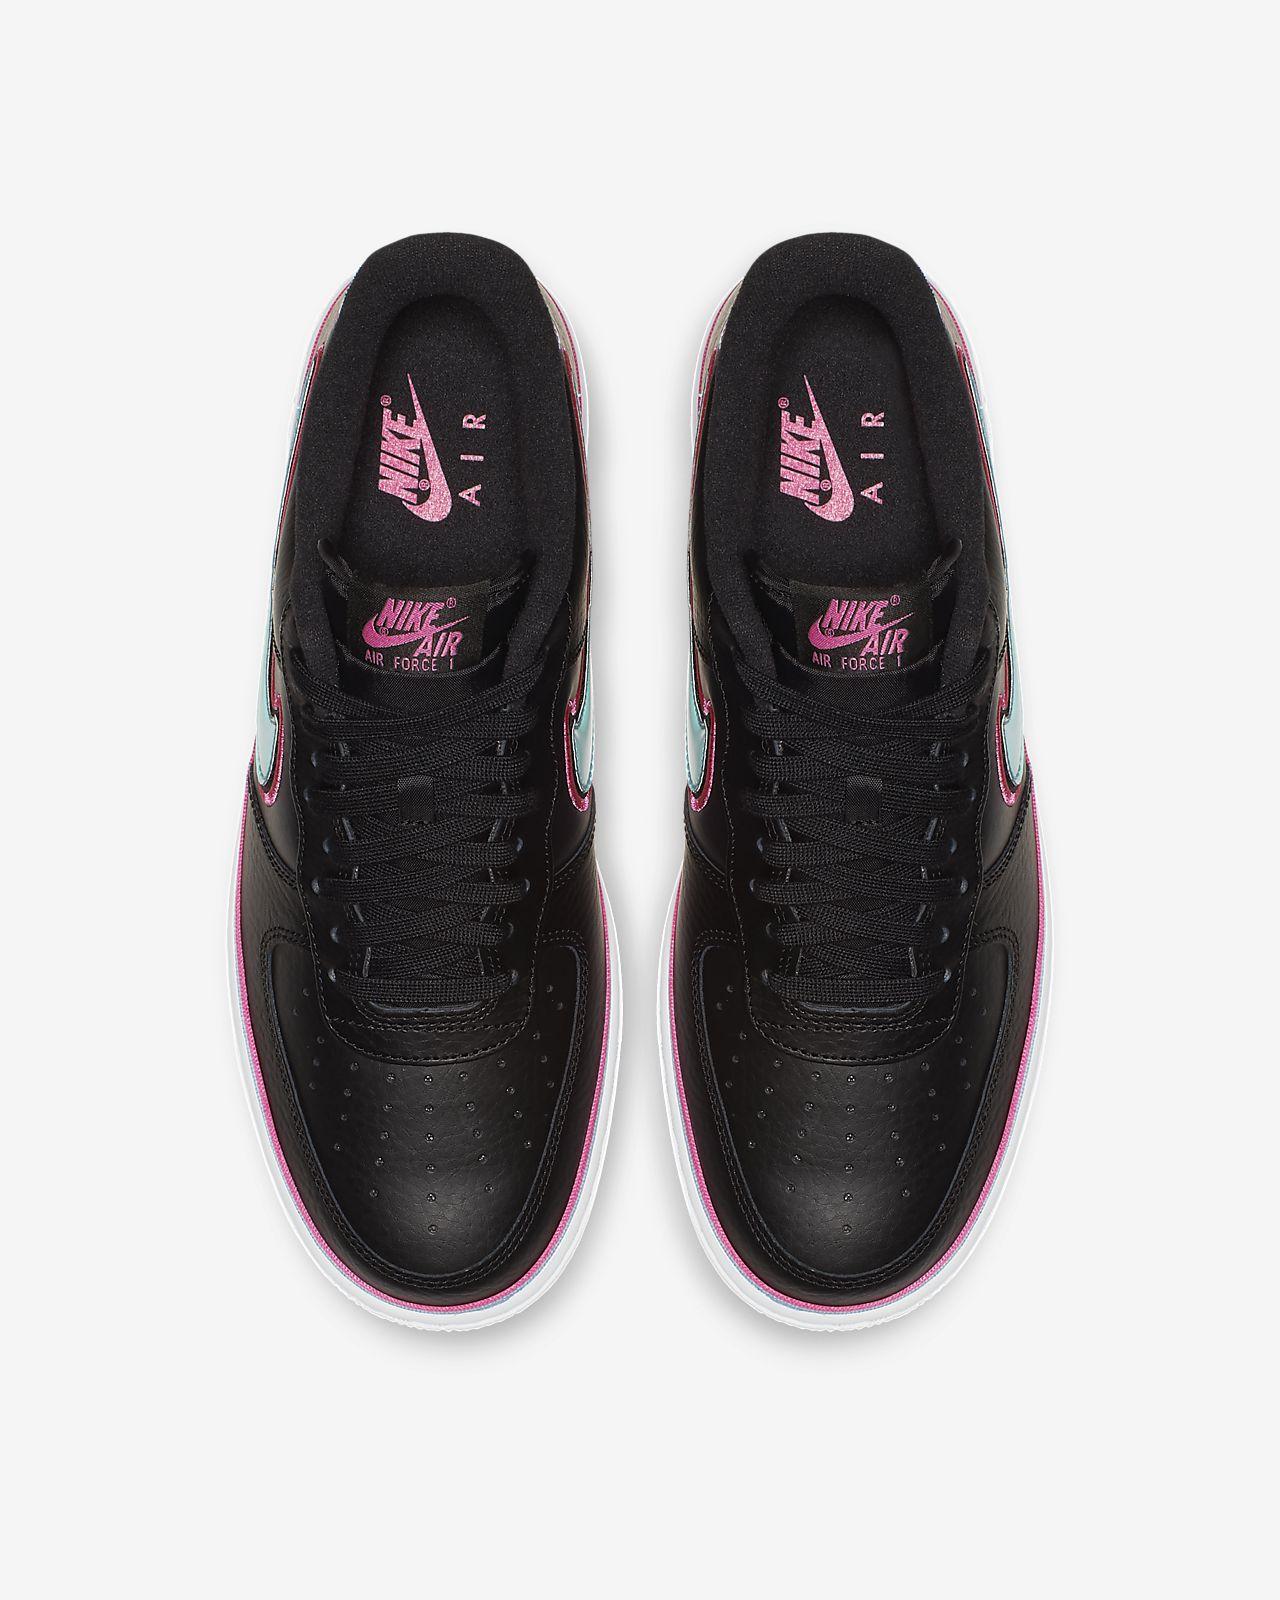 new arrival a8fe8 e066d ... Nike Air Force 1  07 LV8 Sport NBA Shoe